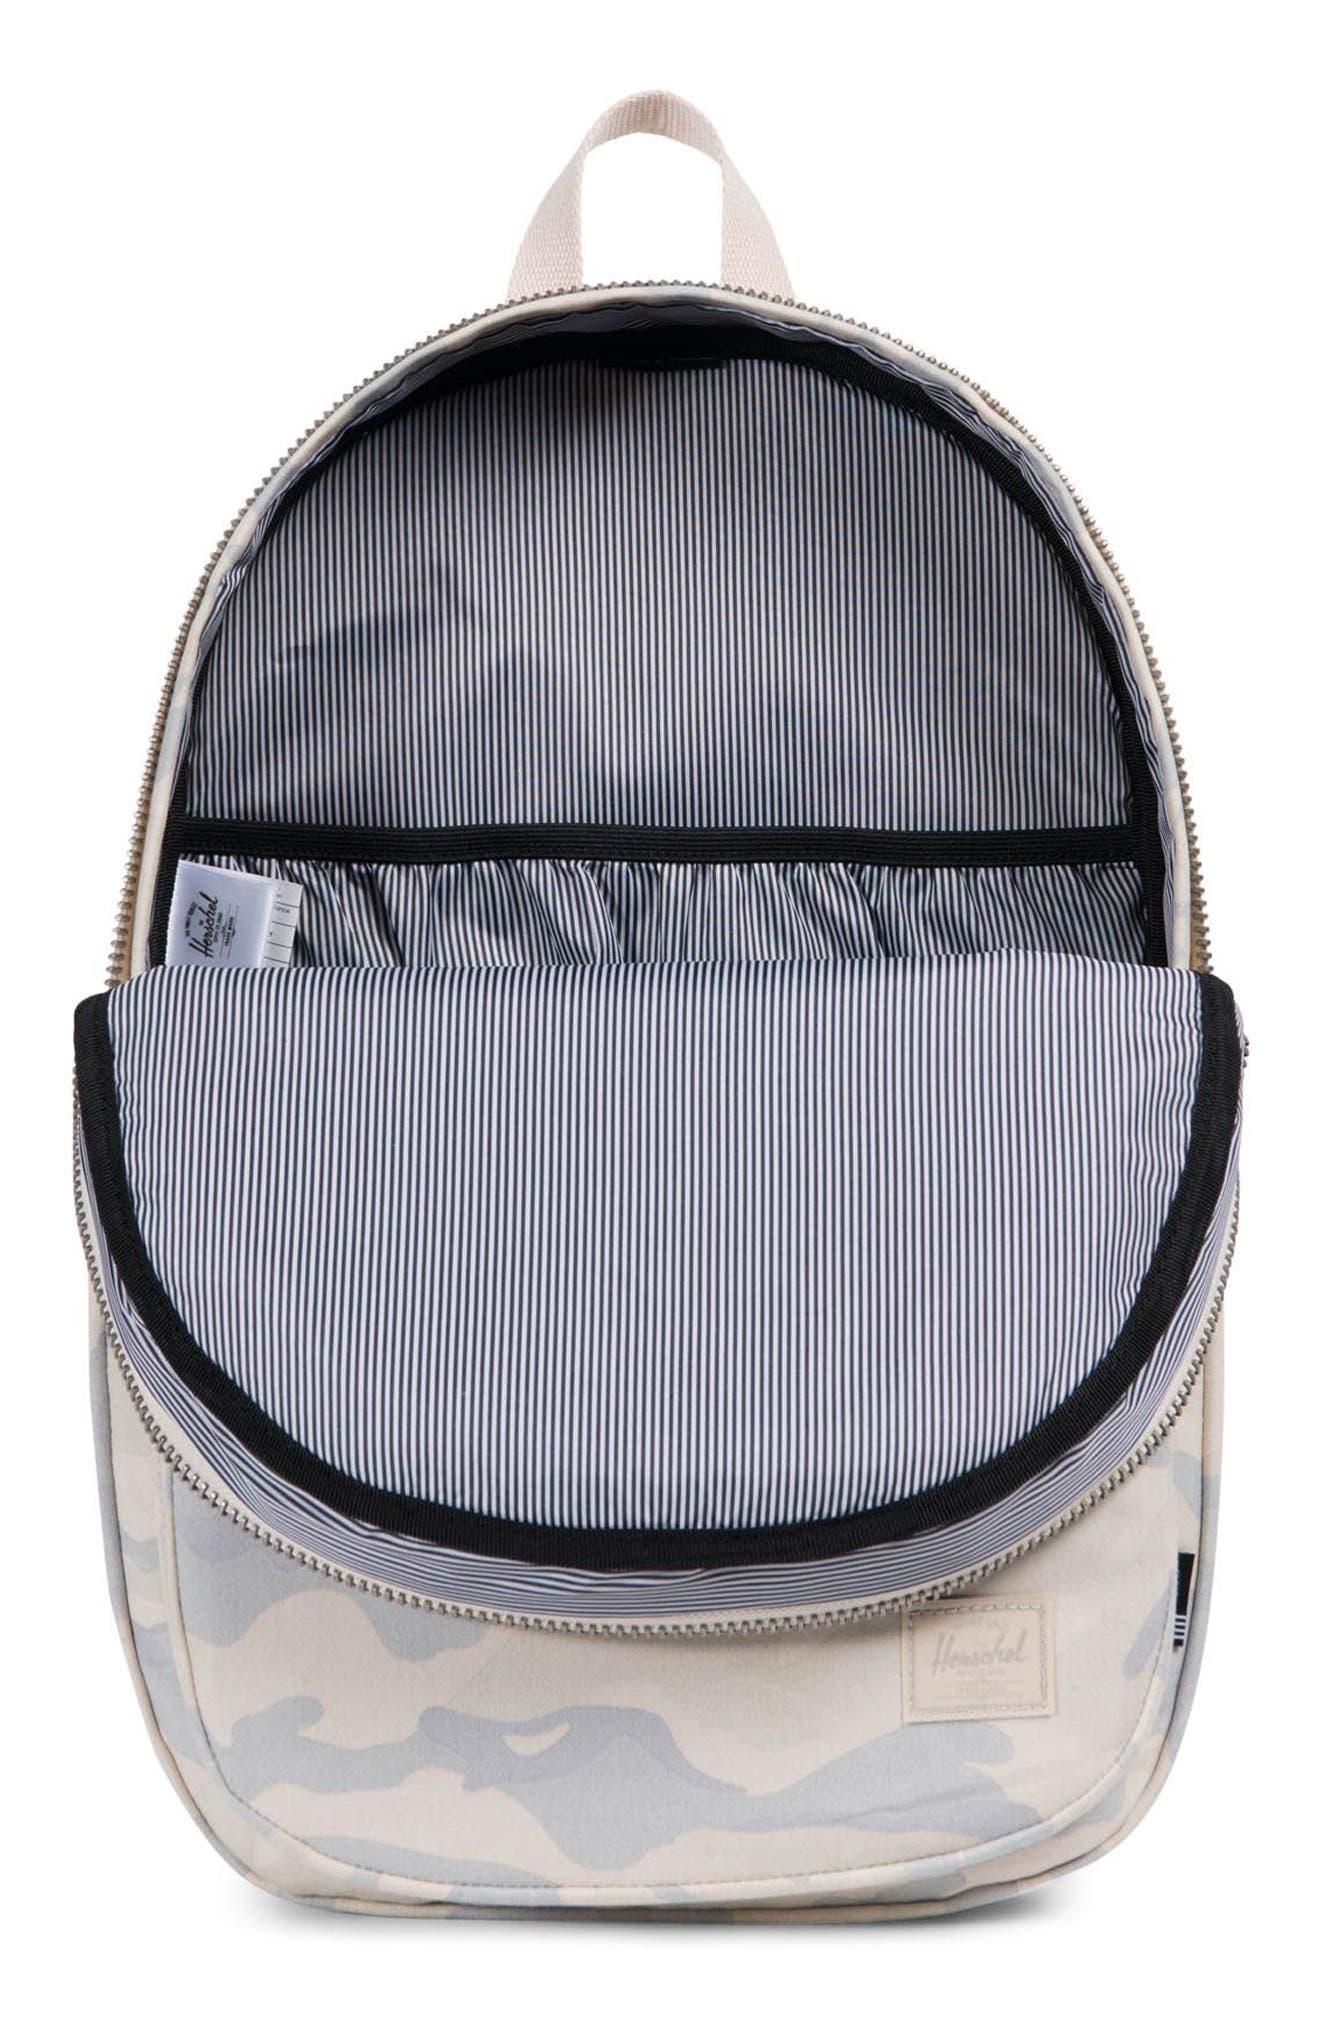 Lawson Backpack,                             Alternate thumbnail 2, color,                             250